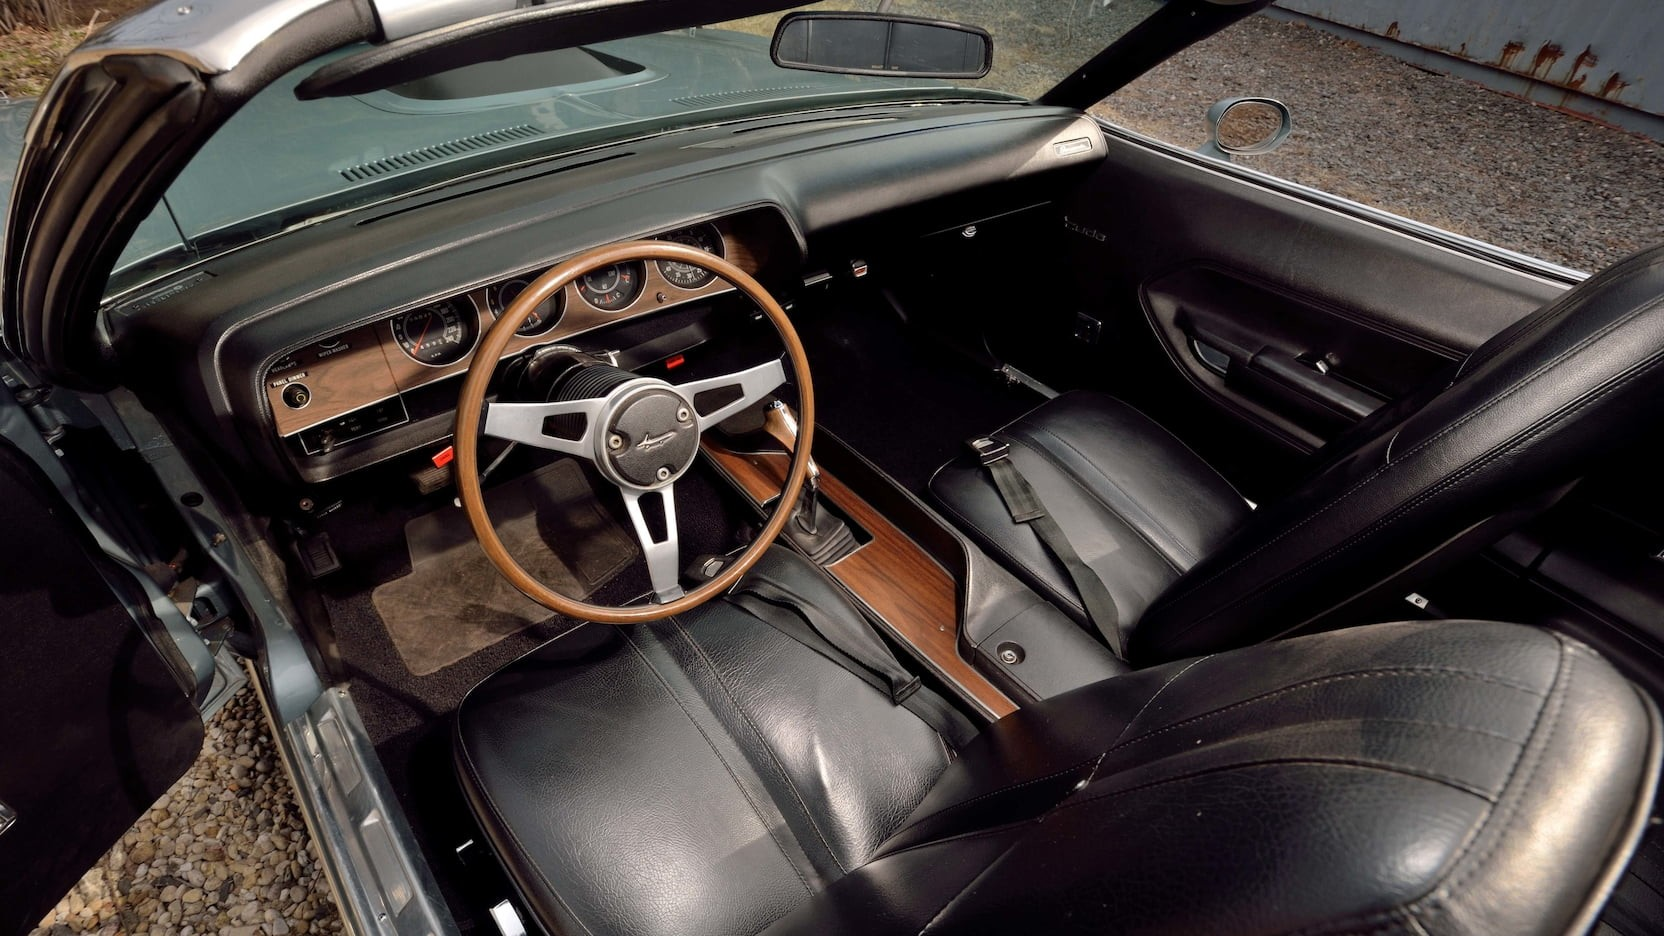 Редкий Plymouth Hemi Cuda 1971 выставили на продажу